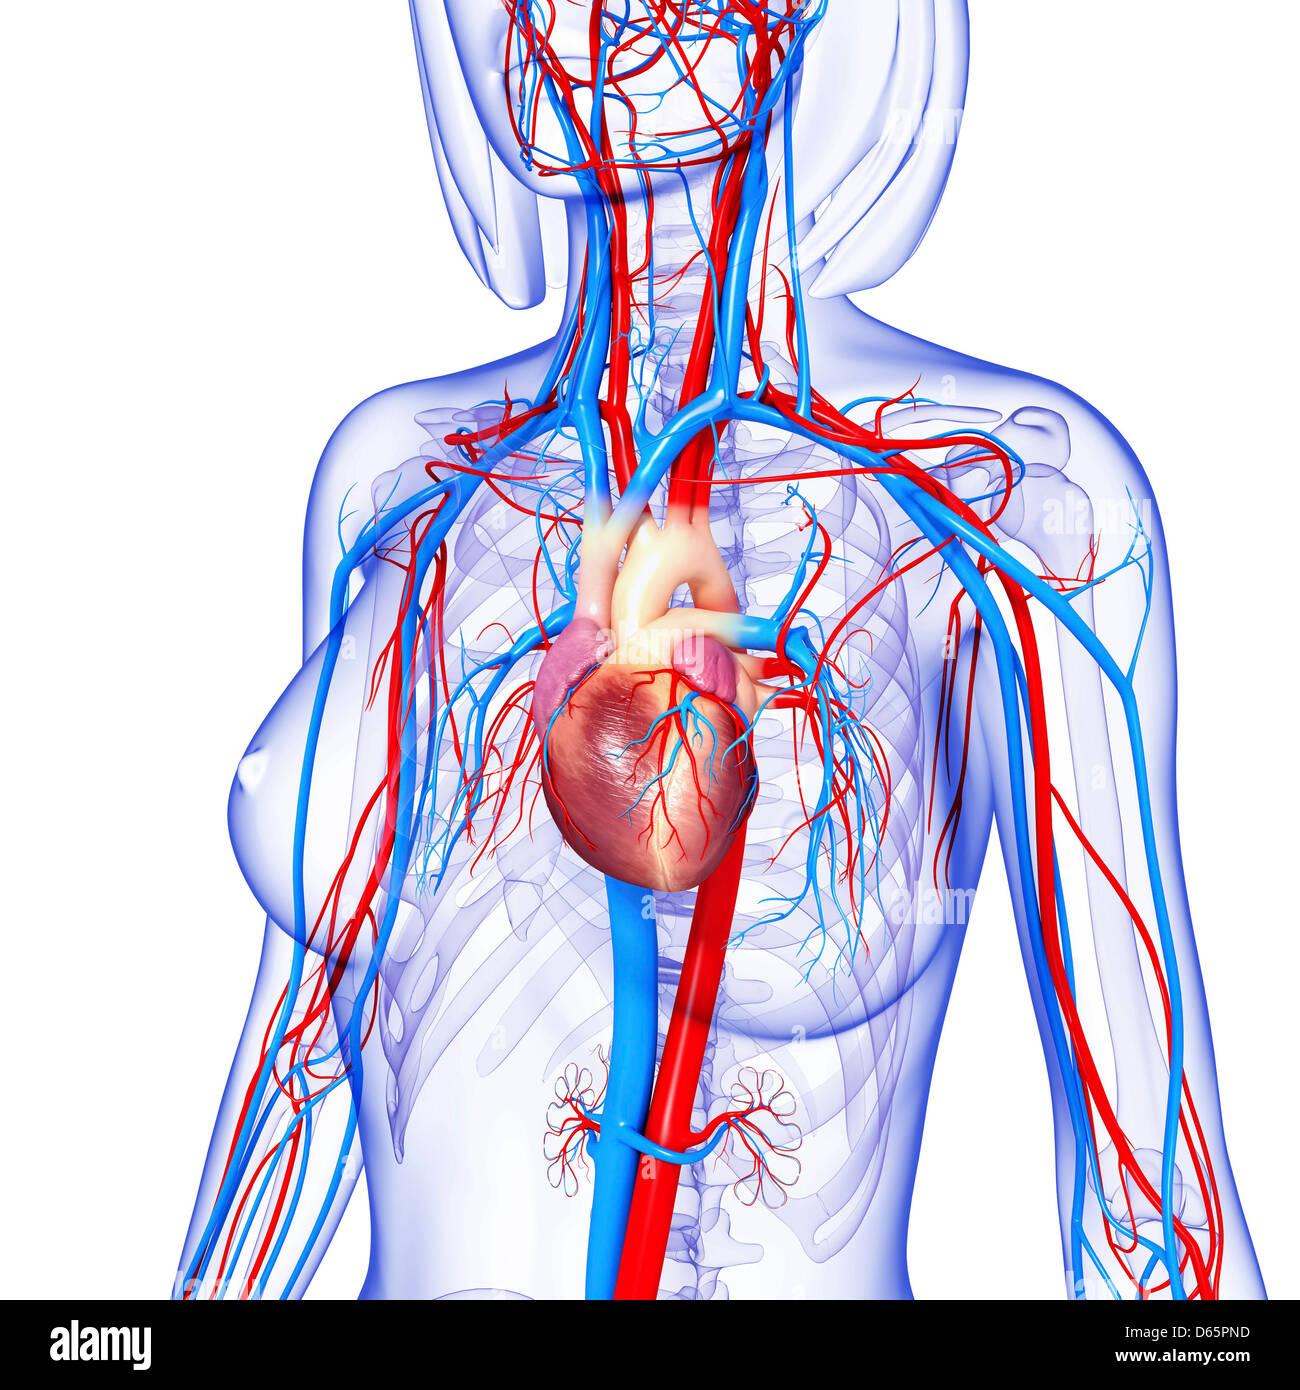 Female cardiovascular system, artwork Stock Photo: 55446649 - Alamy